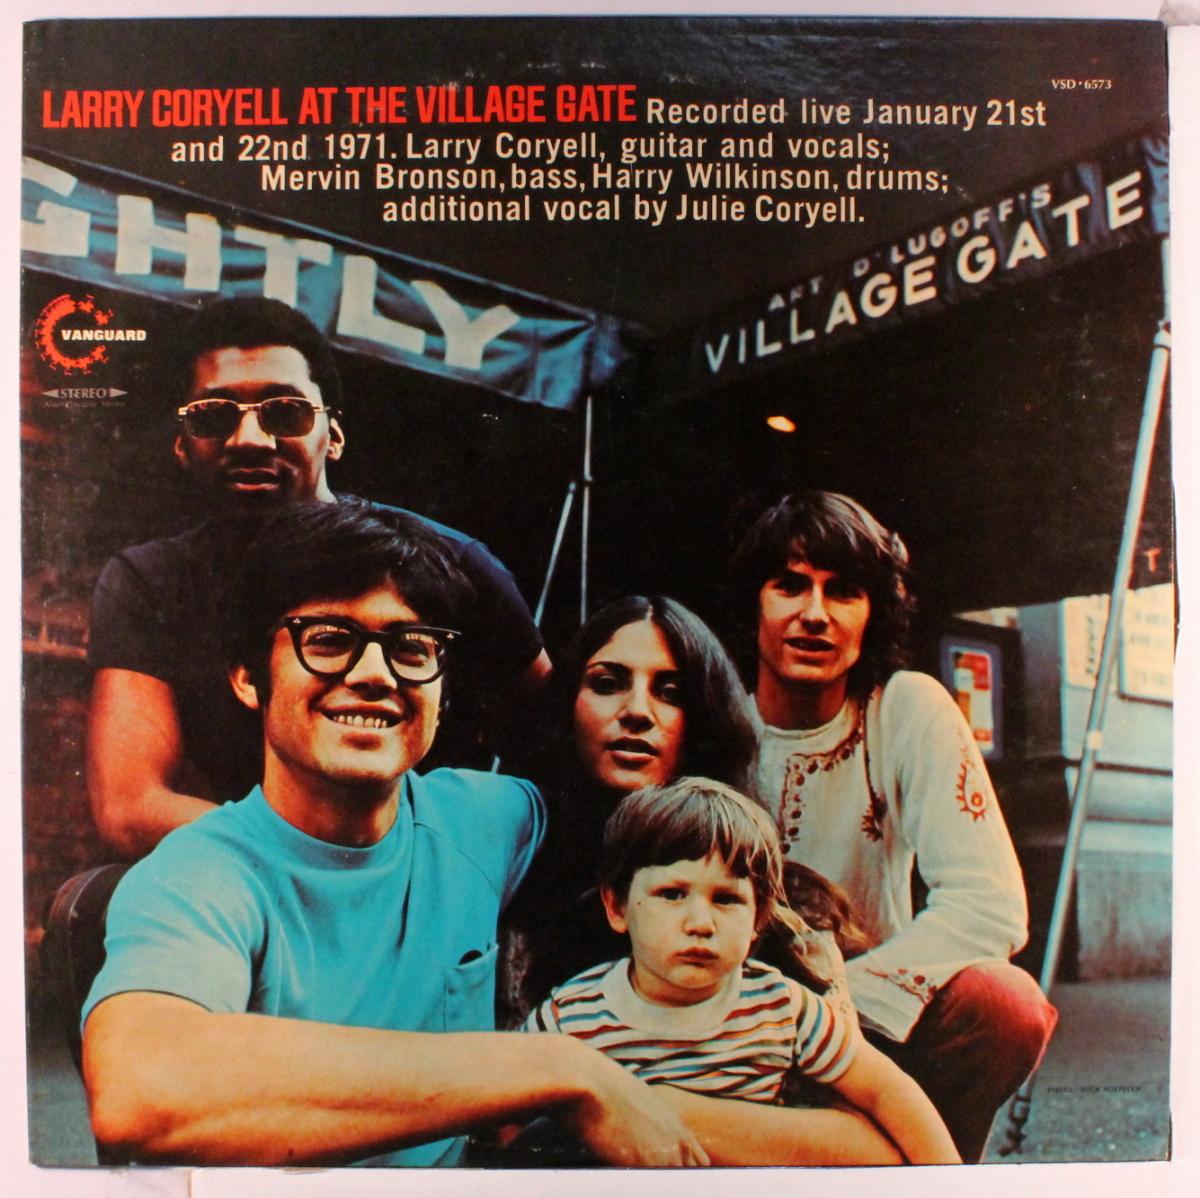 larry_coryell_at_the_village_gate